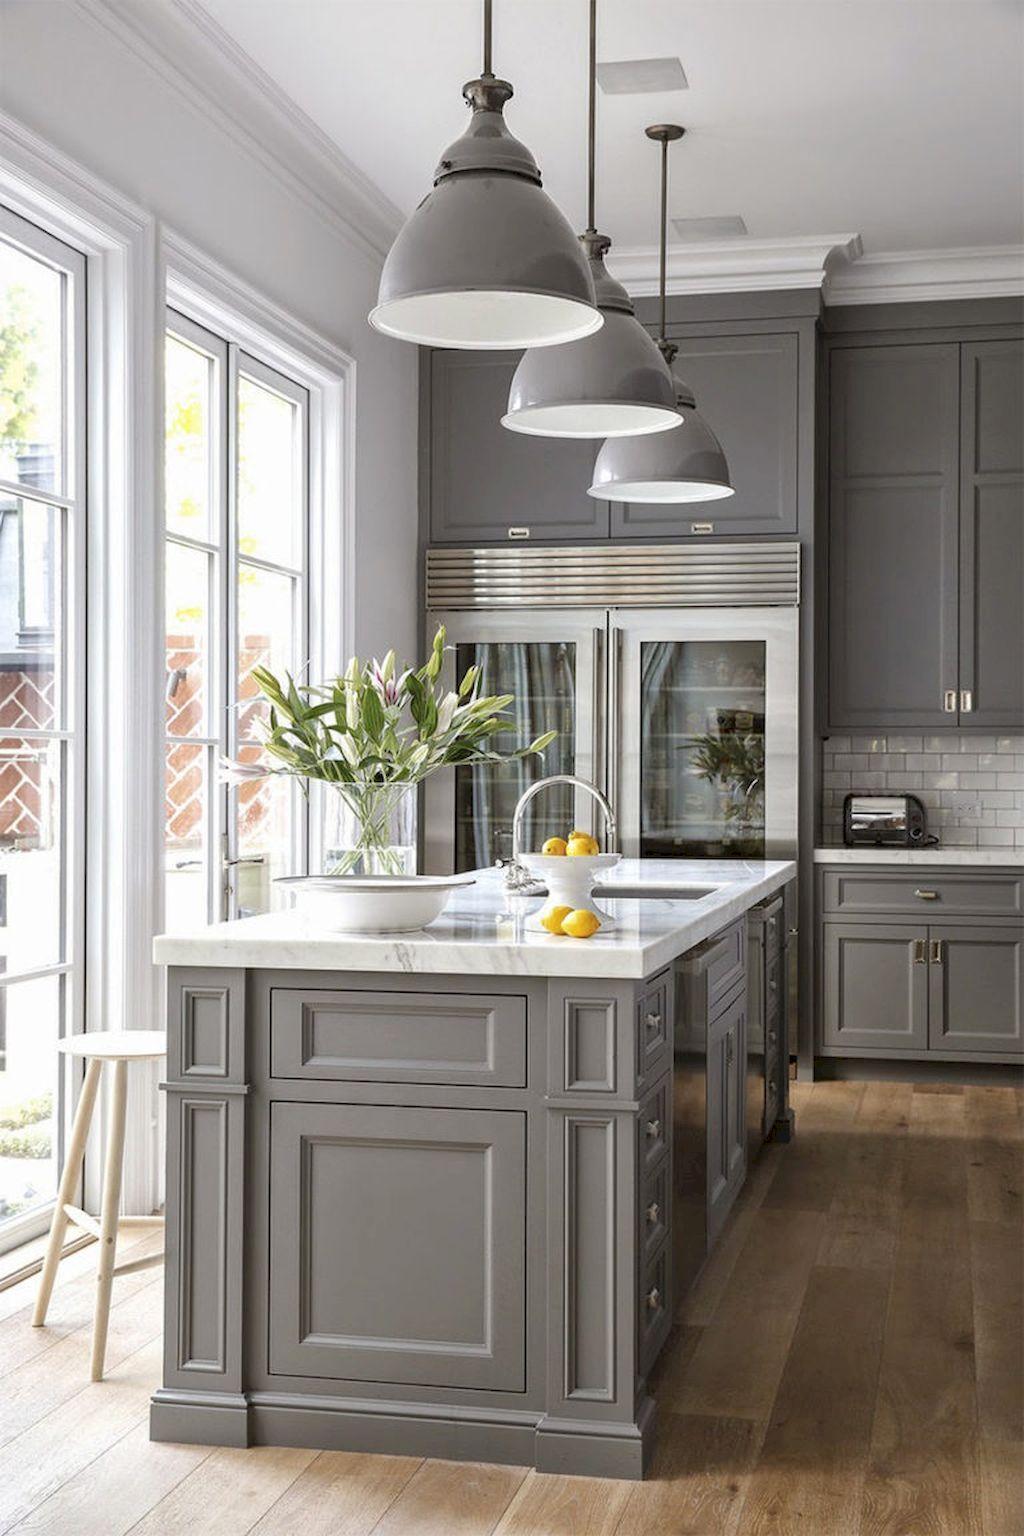 Best Modern Farmhouse Kitchen Coloring Ideas With Creative Farmhouse Kitchen Backsplashes And Colorfu Kitchen Remodel Small Grey Kitchen Designs Modern Kitchen